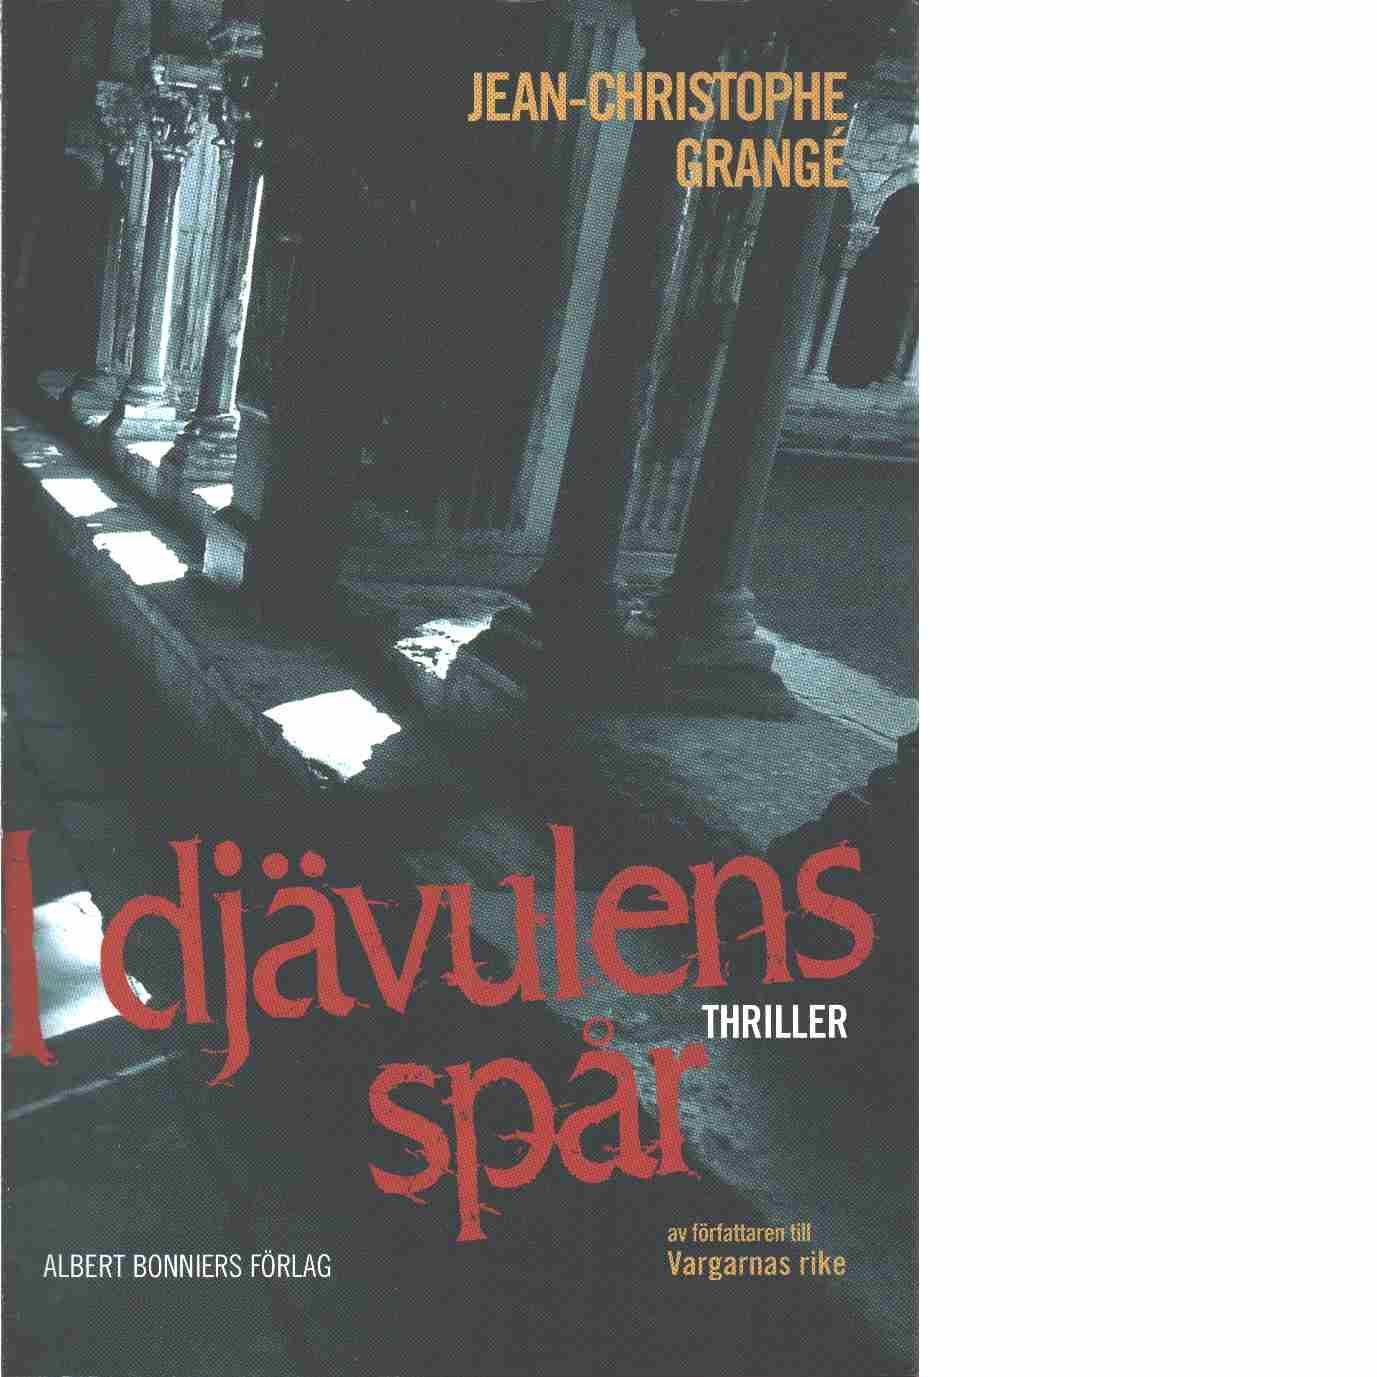 I djävulens spår - Grangé, Jean-Christophe